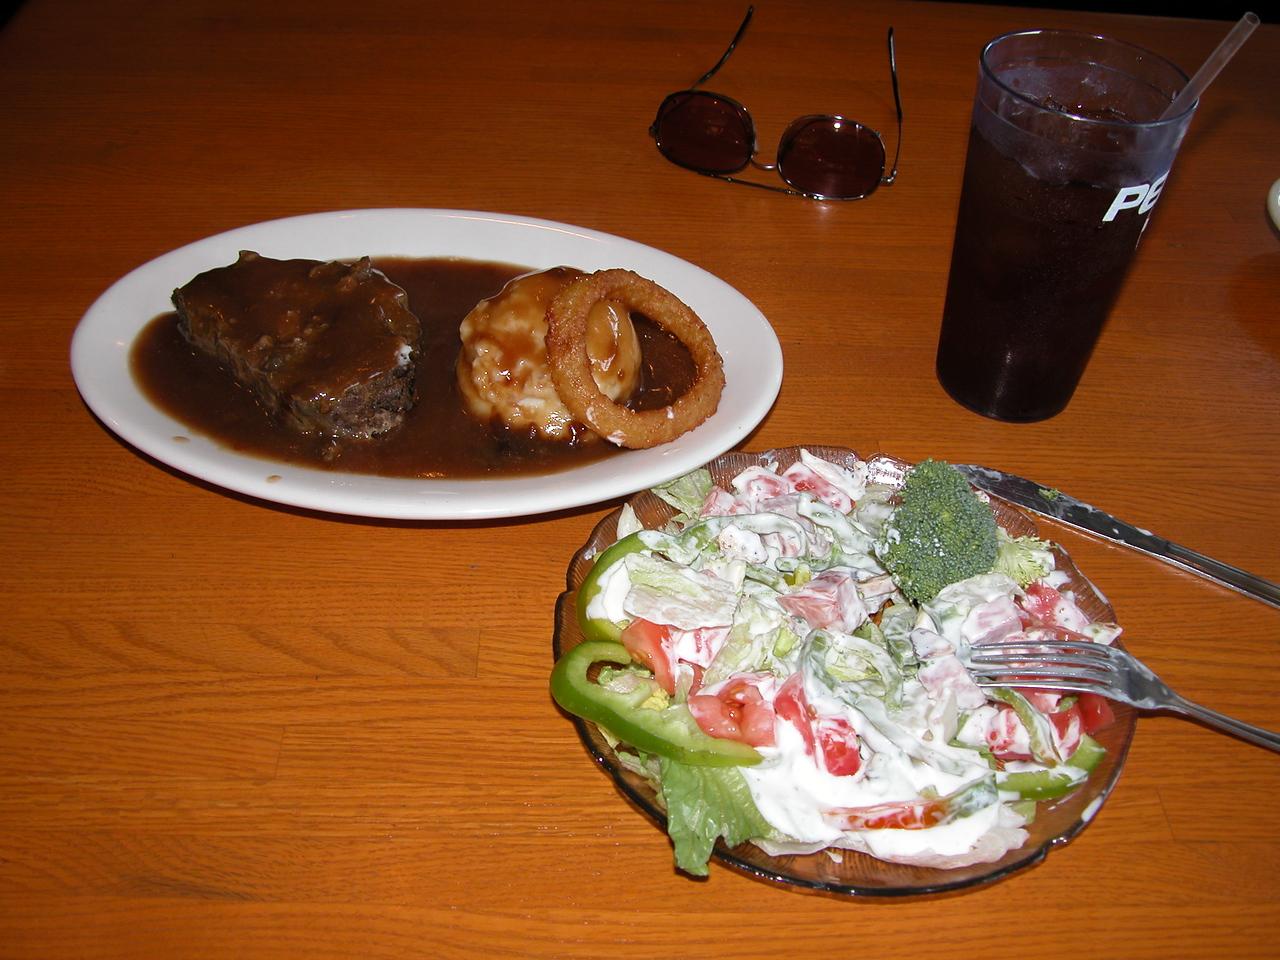 DJ's Diner.  I had the meatloaf and salad.  Quite good.